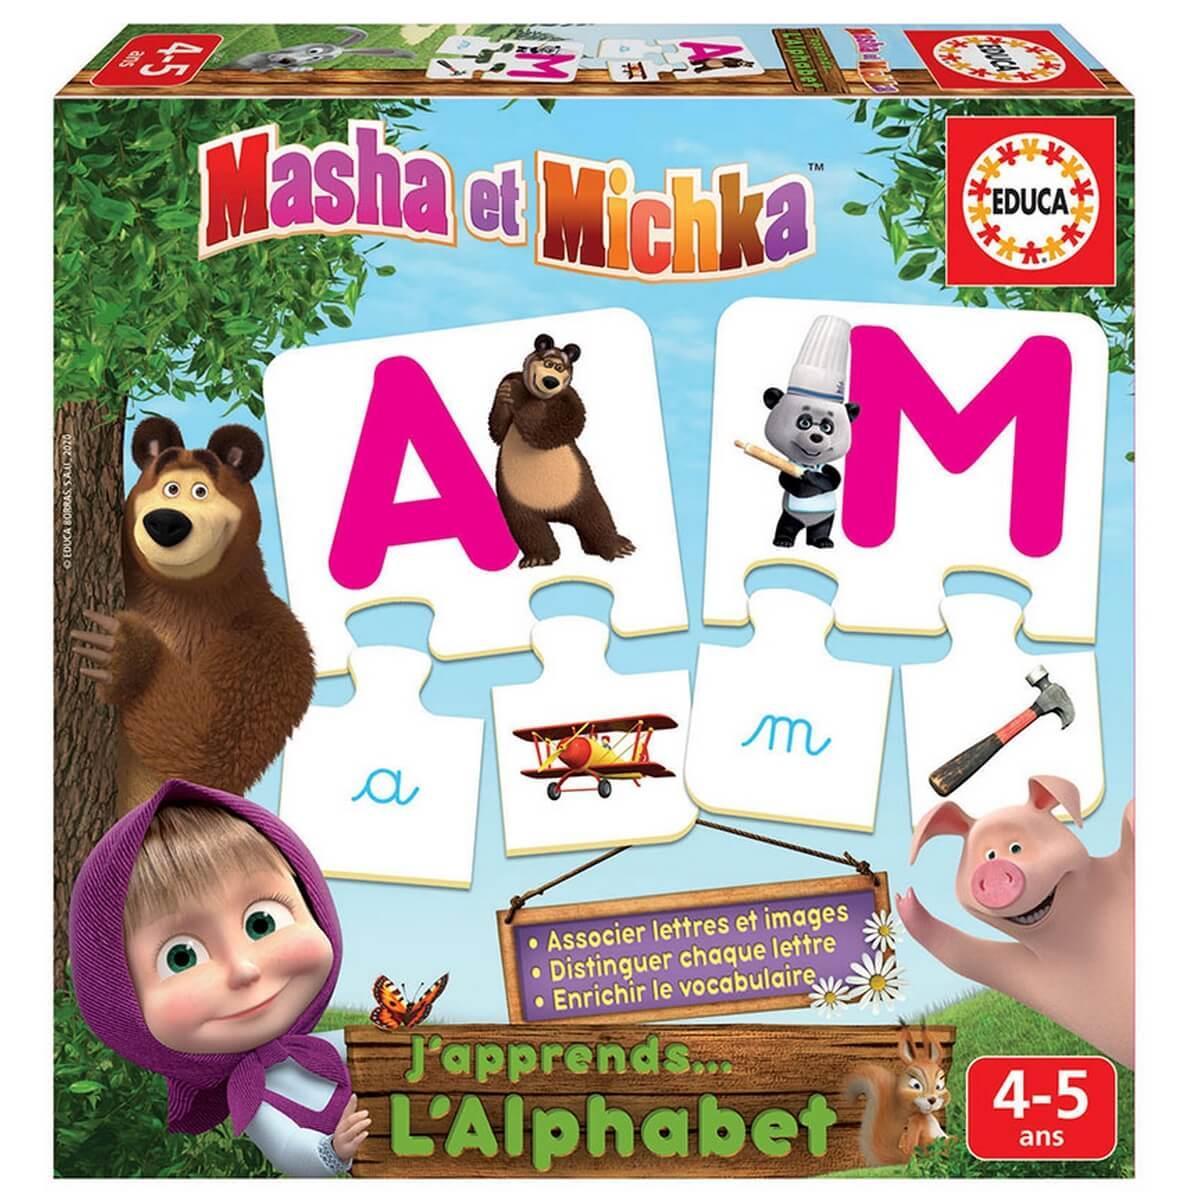 J'apprends l'alphabet : Masha et Michka